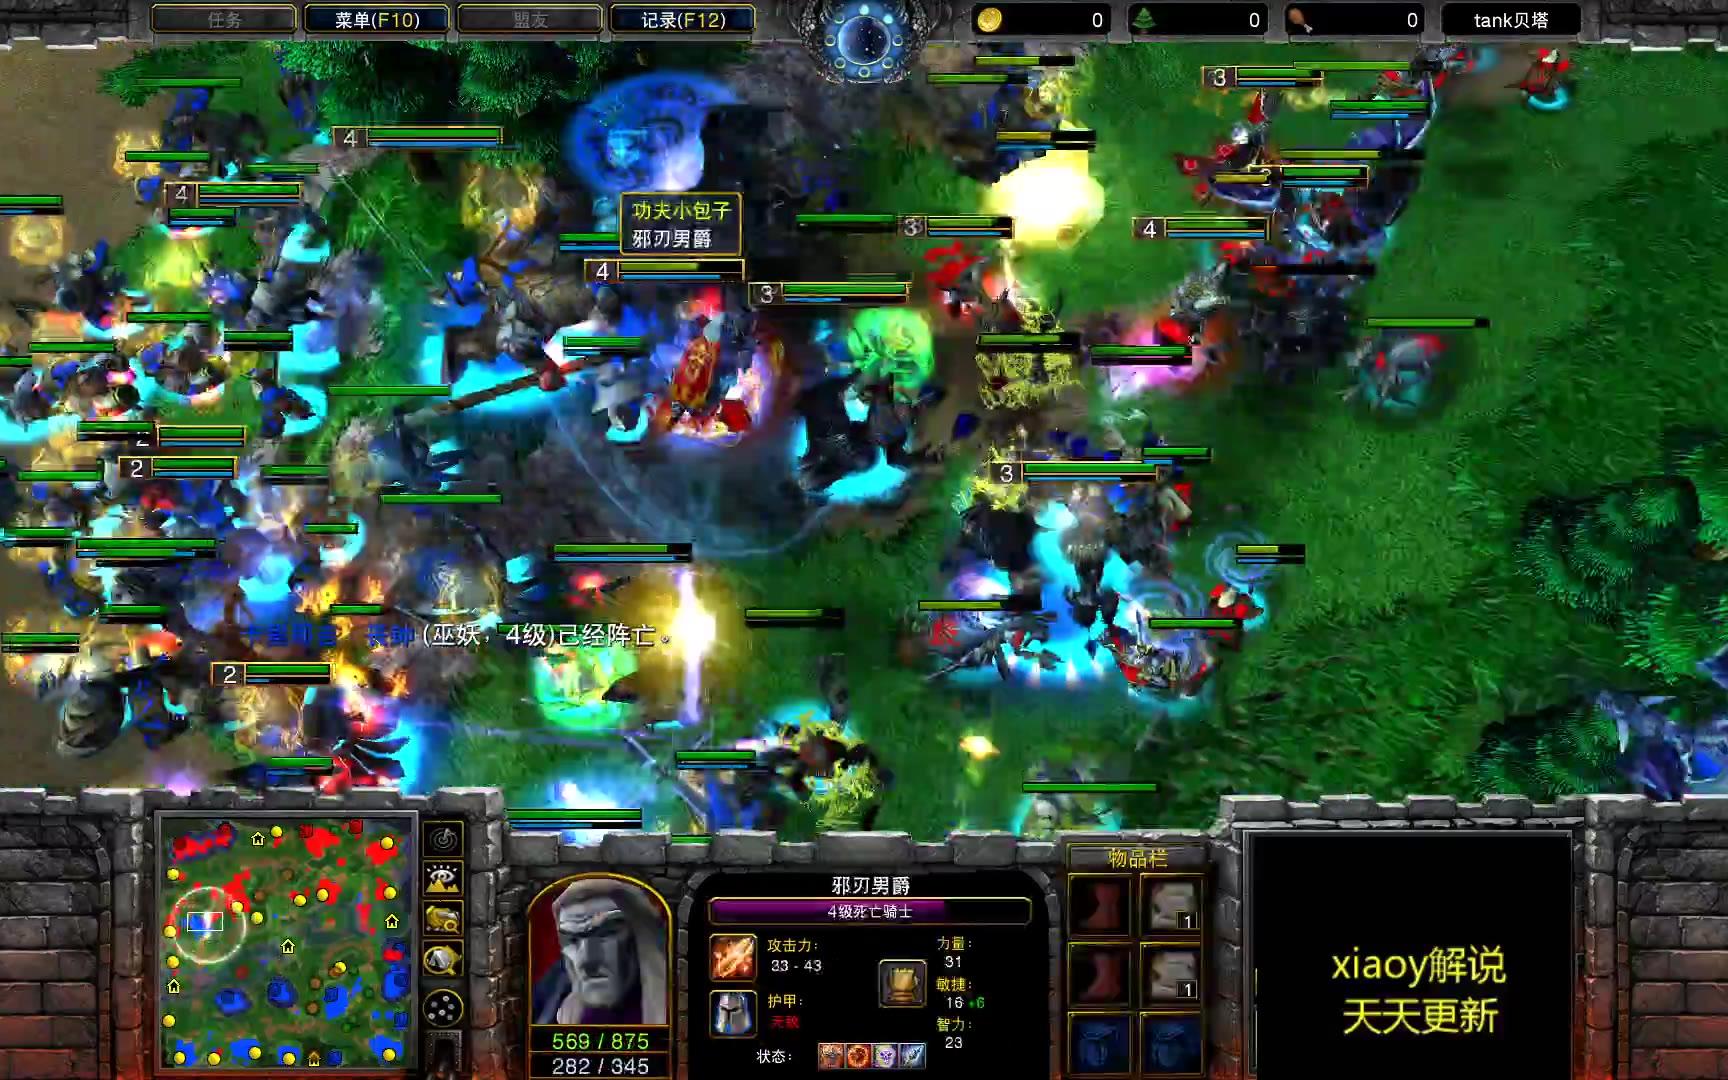 6v6 满屏幕的伤害 魔兽争霸xiaoy解说 1.329版本最后的66